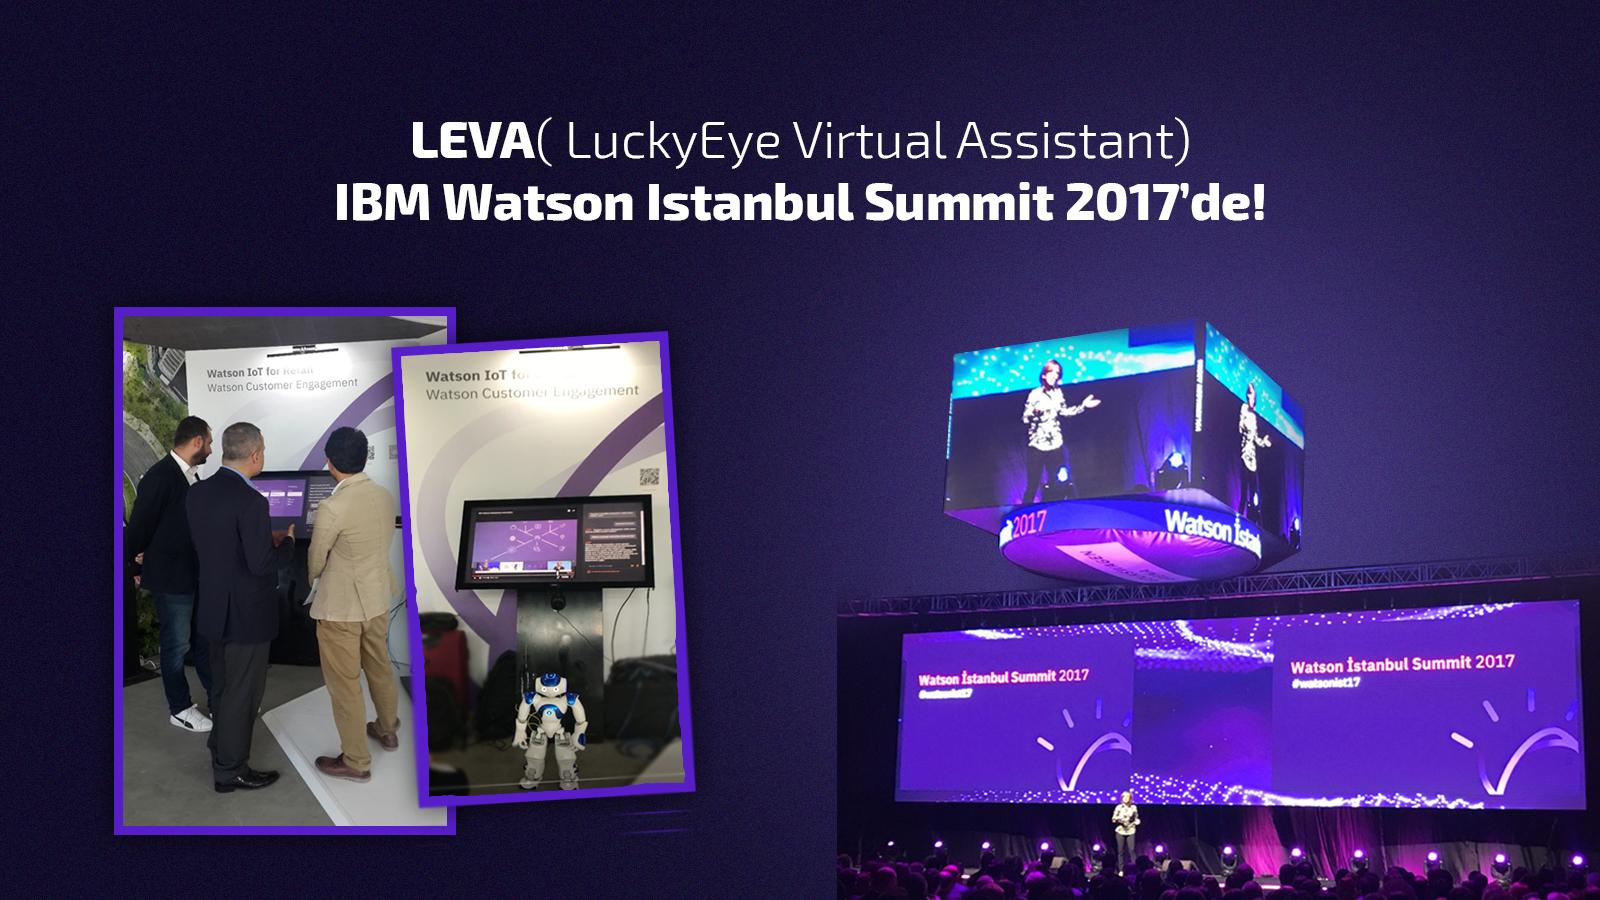 LEVA (LuckyEye Virtual Assistant) IBM Watson İstanbul Summit 2017'de